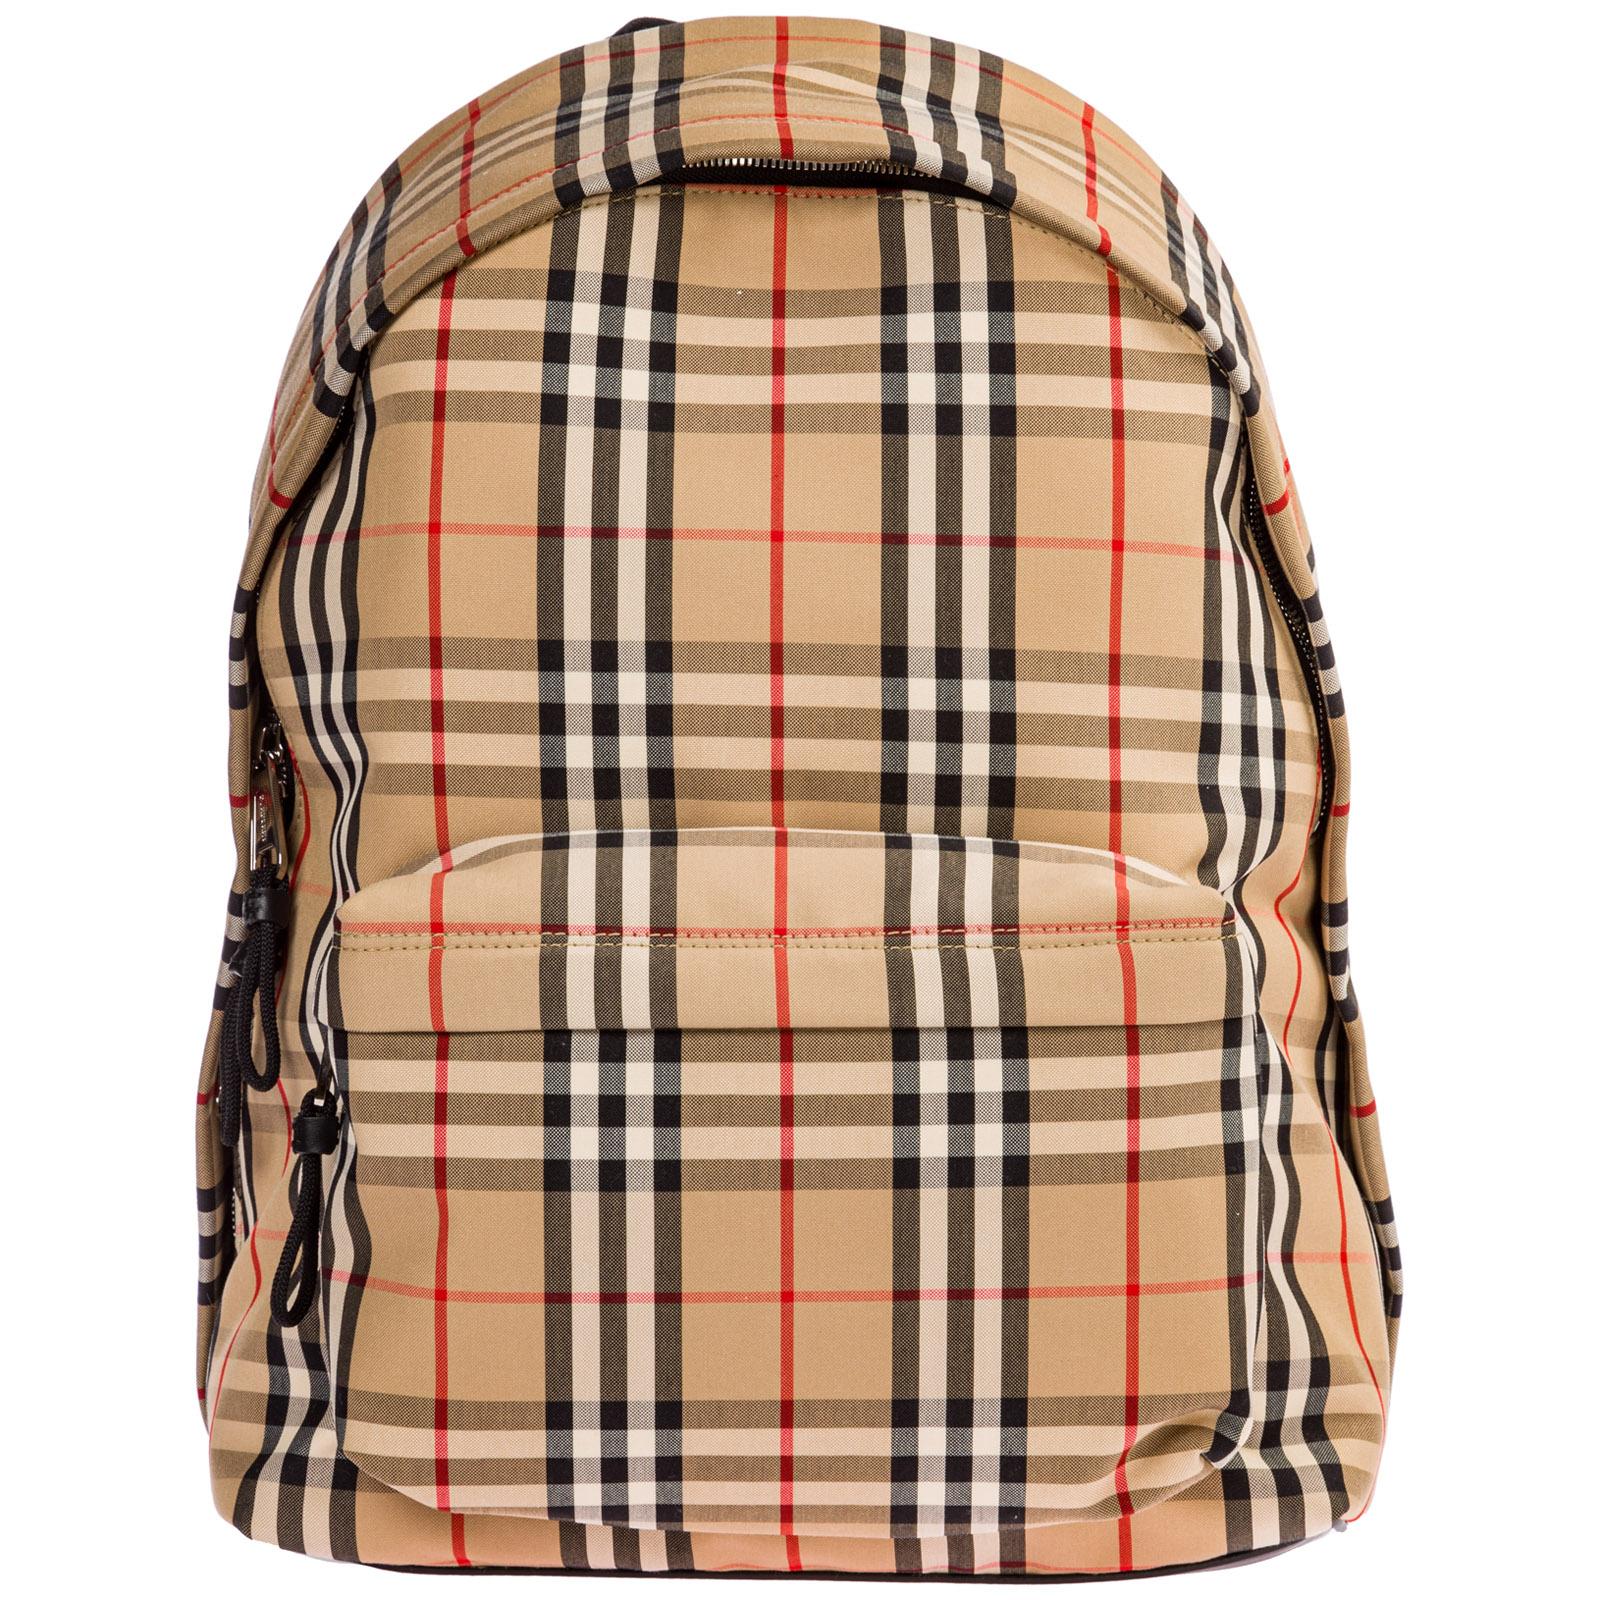 Burberry Men's Rucksack Backpack Travel In Archive Beige